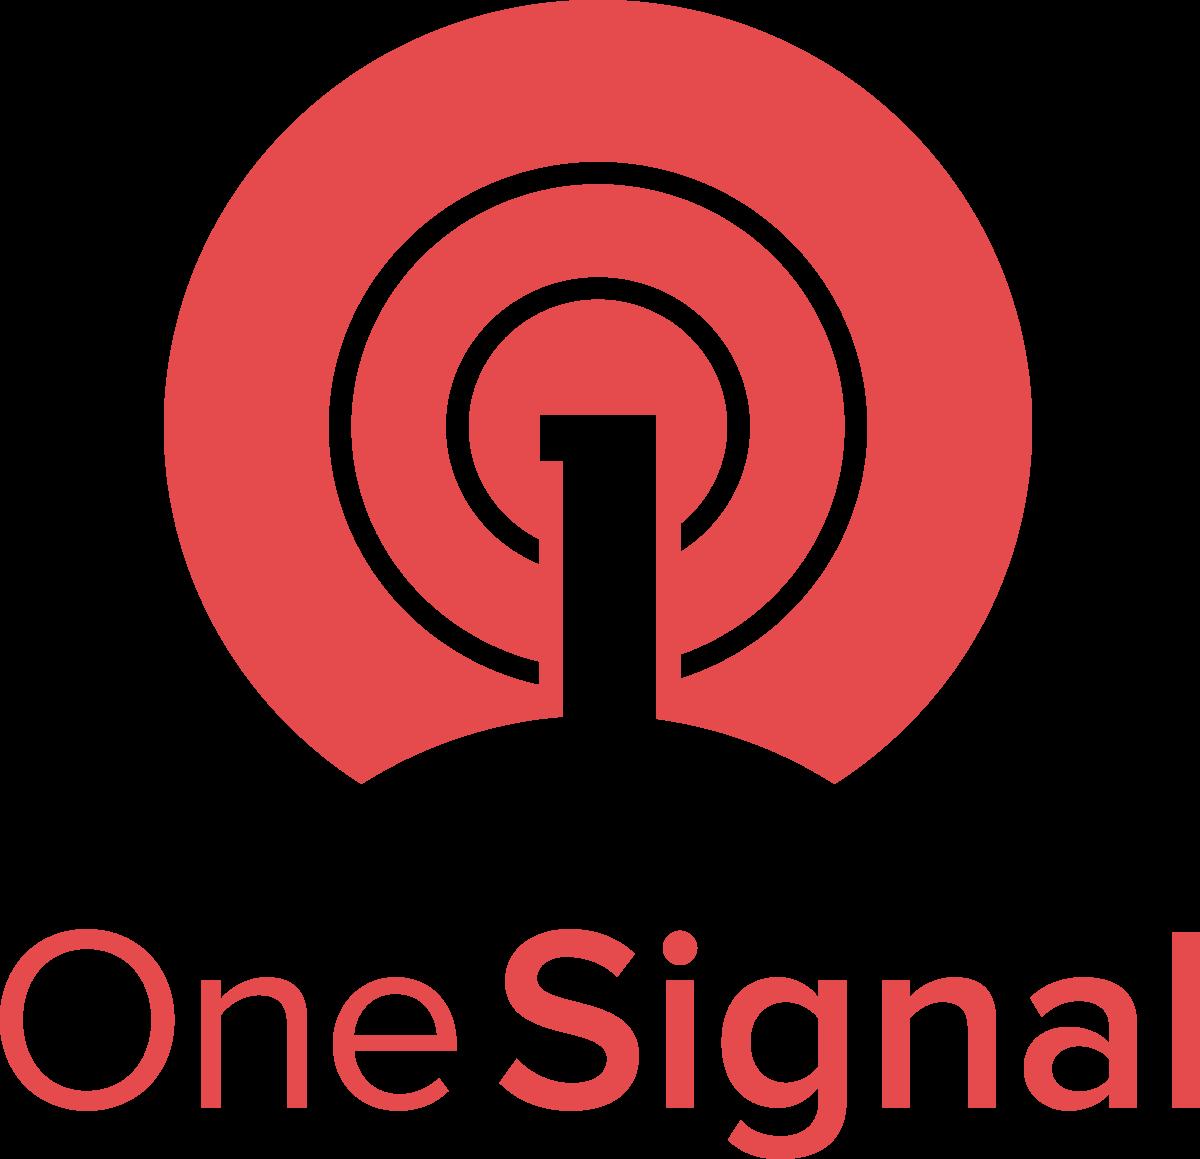 onesignal-logo_en-us.png